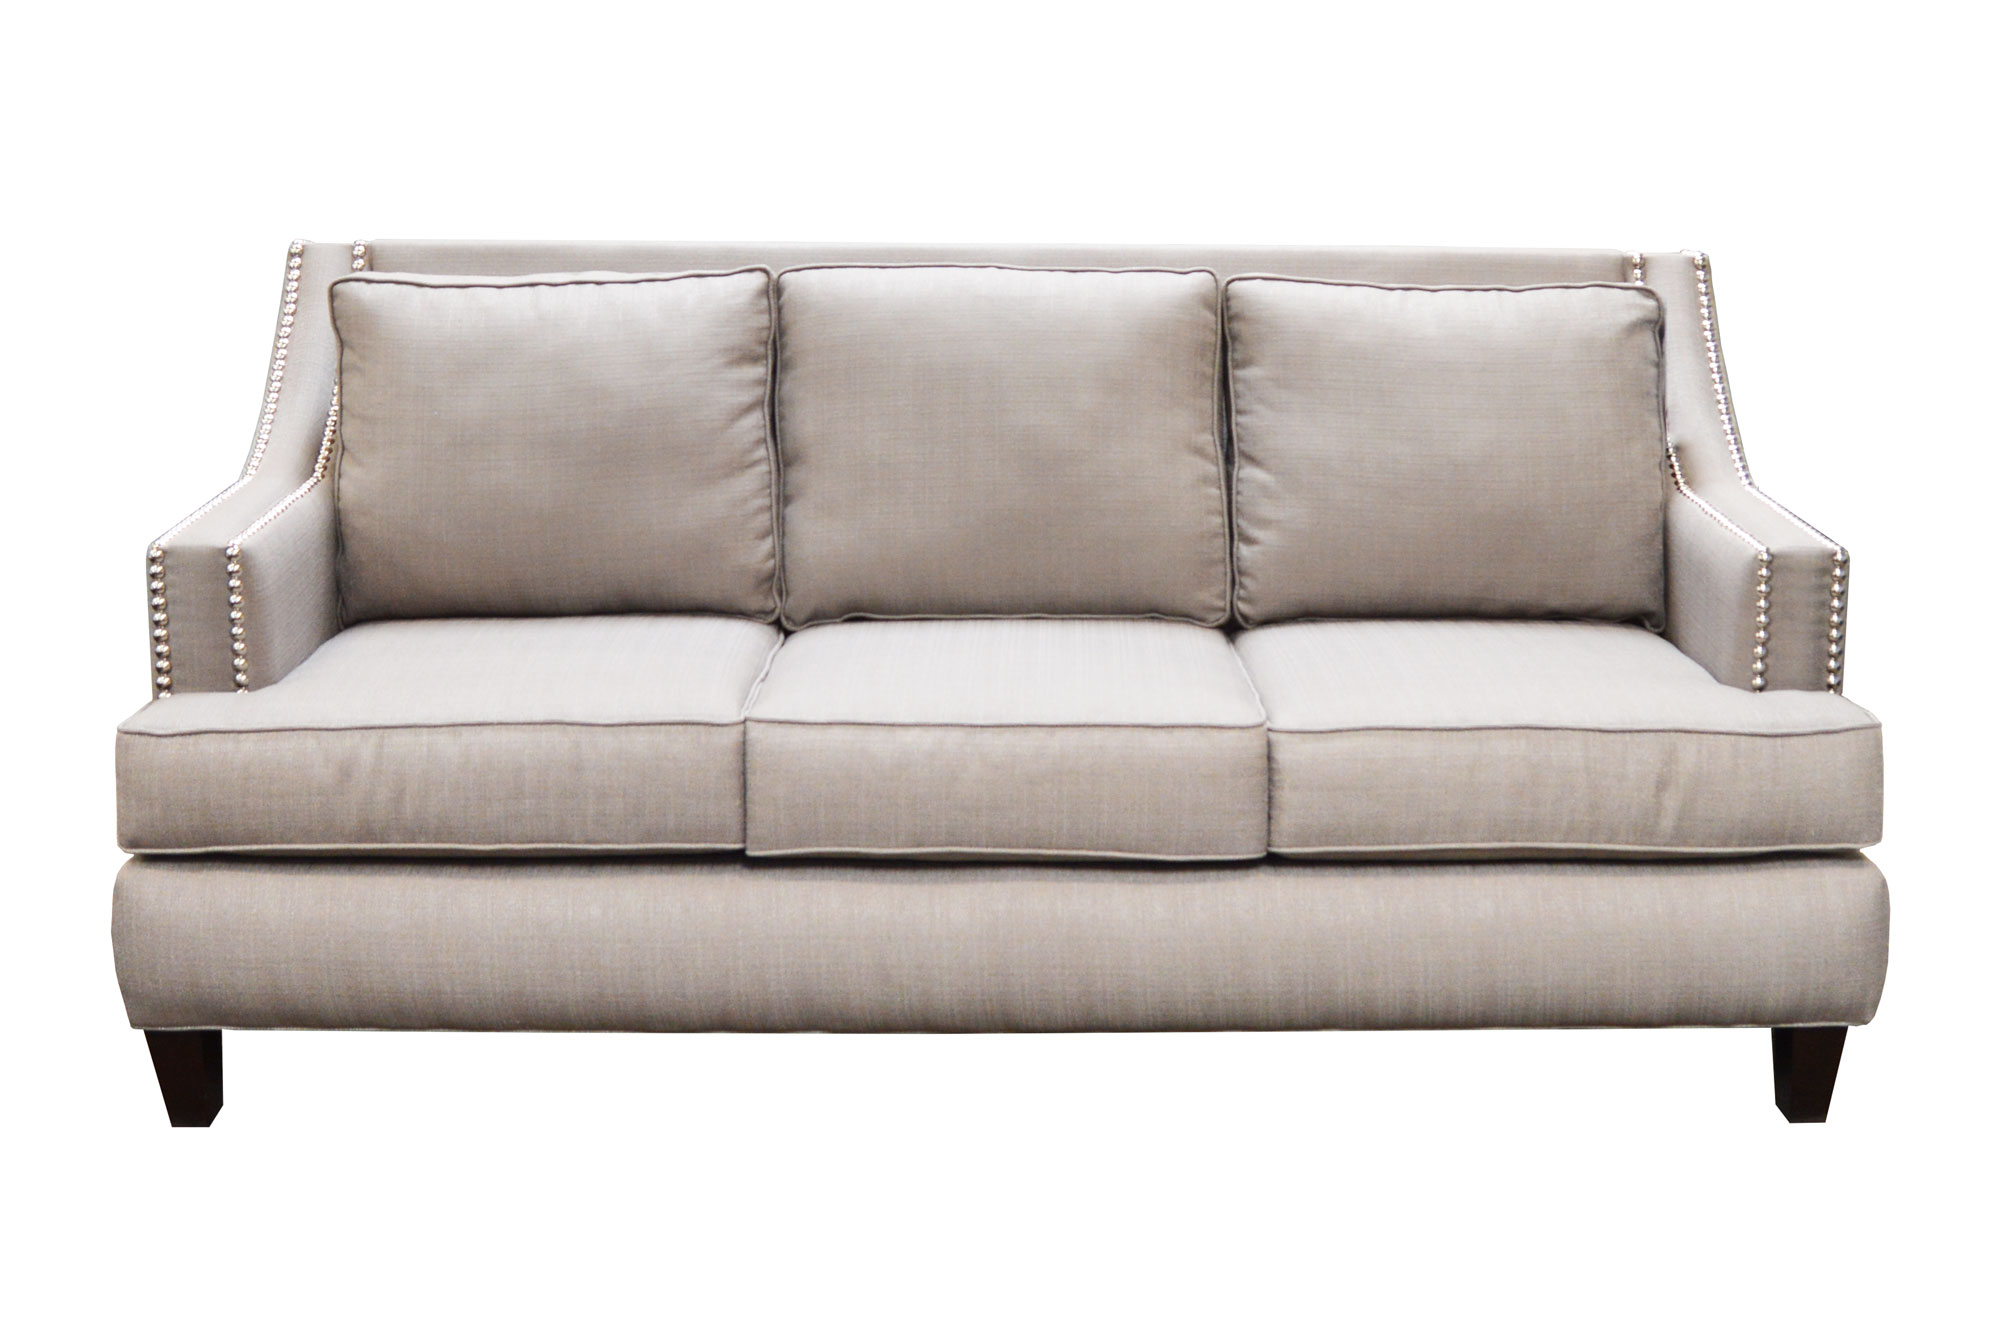 sofas for less bubble sofa versace long beach custom 4